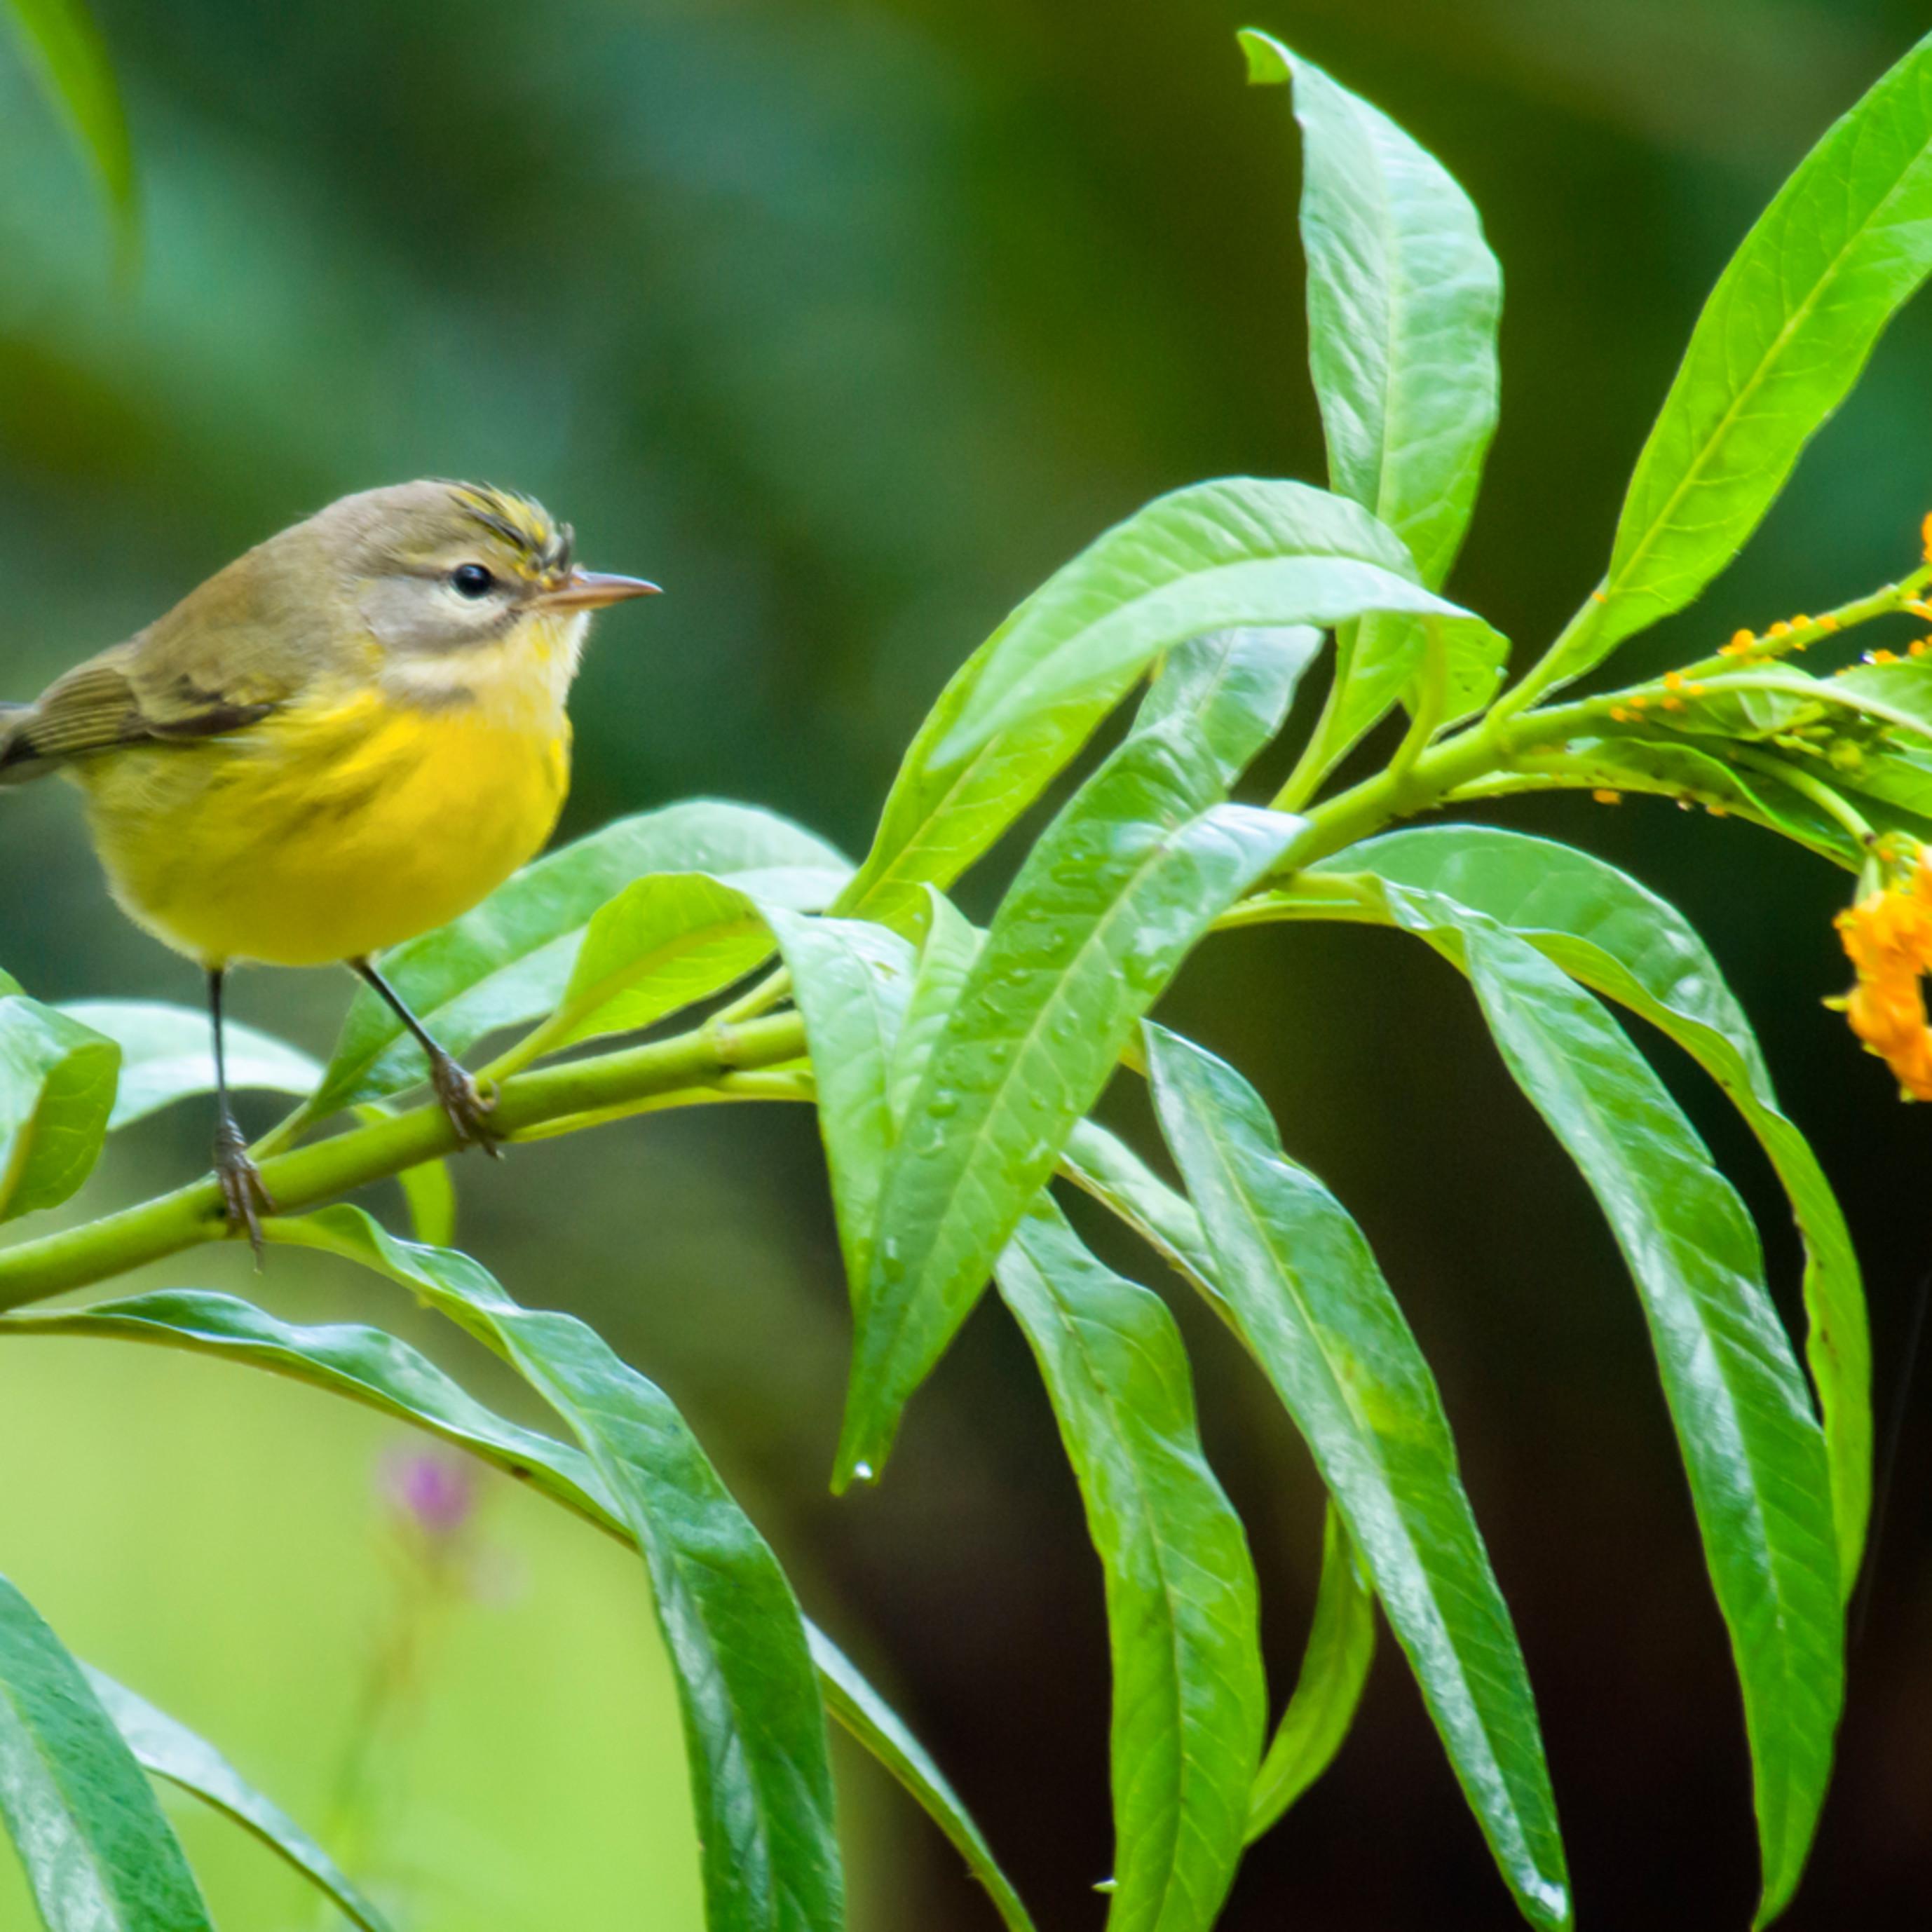 Backyard birds   sept 2019 20190918 2462 iok51s